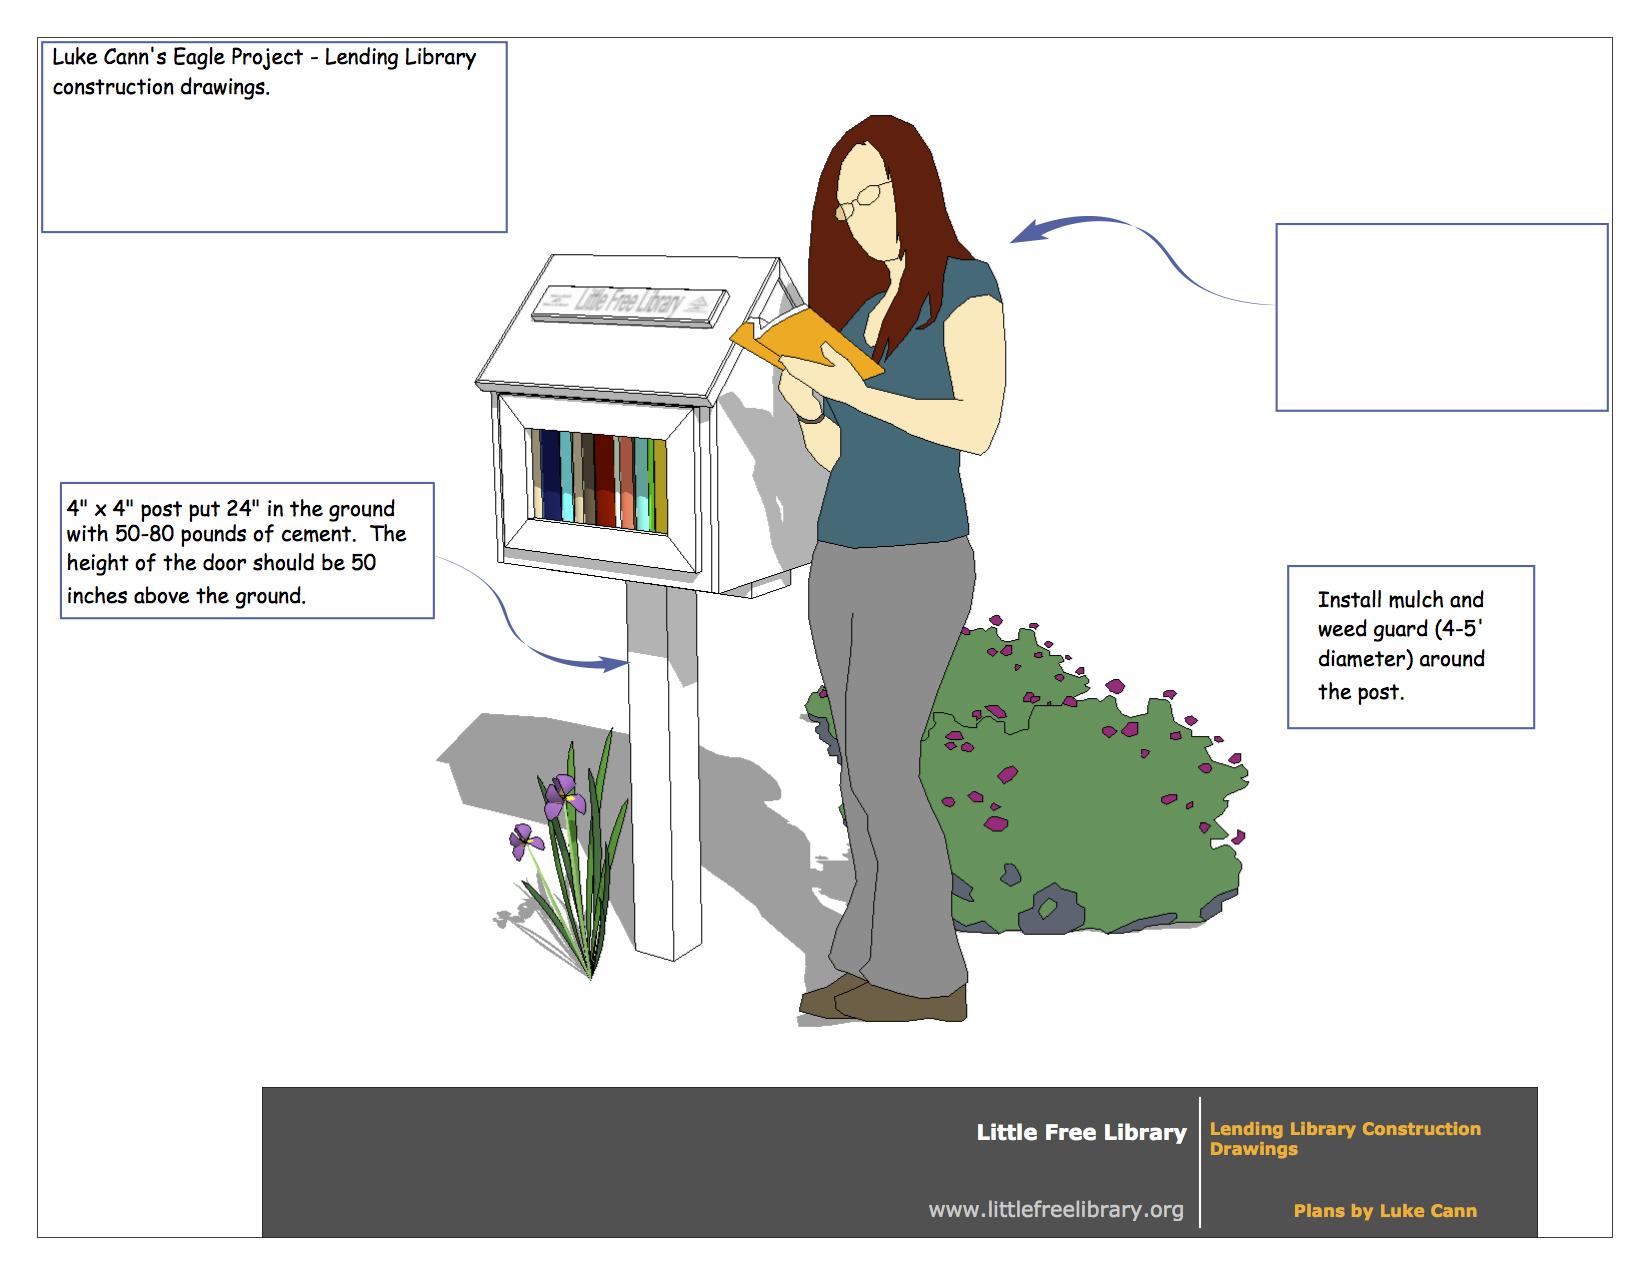 Luke Cann's Eagle Project_Lending Library Construction Drawings_OCT17.jpg